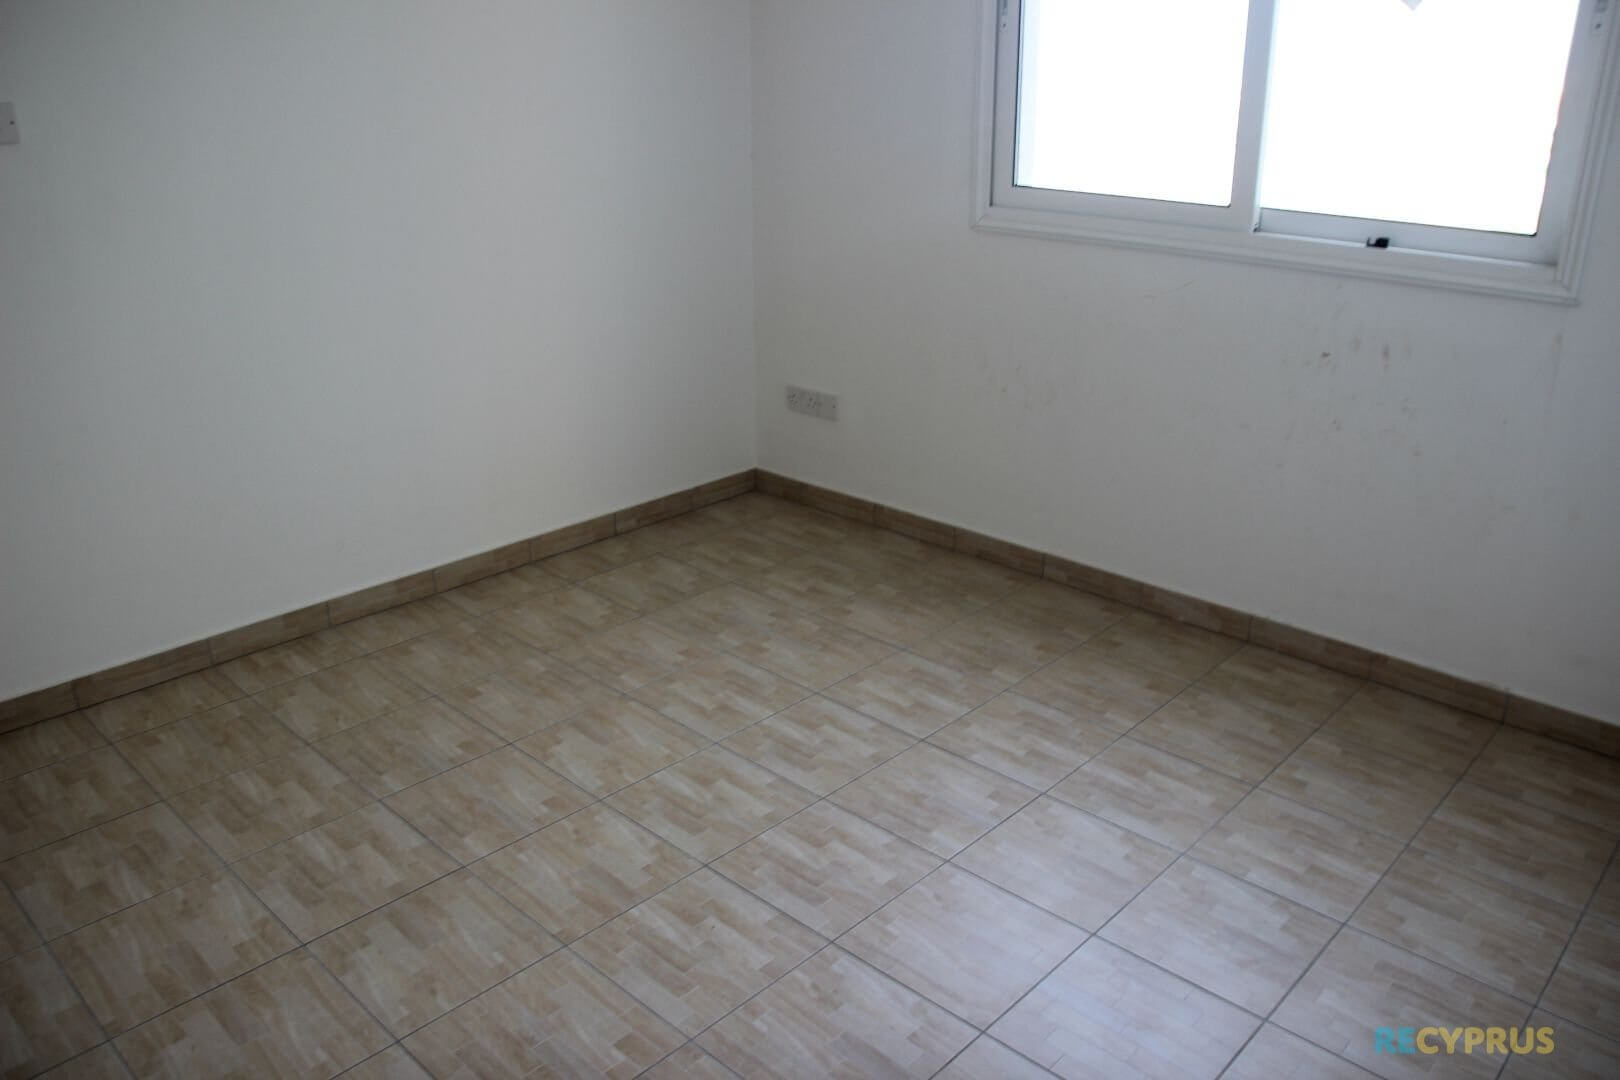 Apartment for sale Kapparis Famagusta Cyprus 8 3519